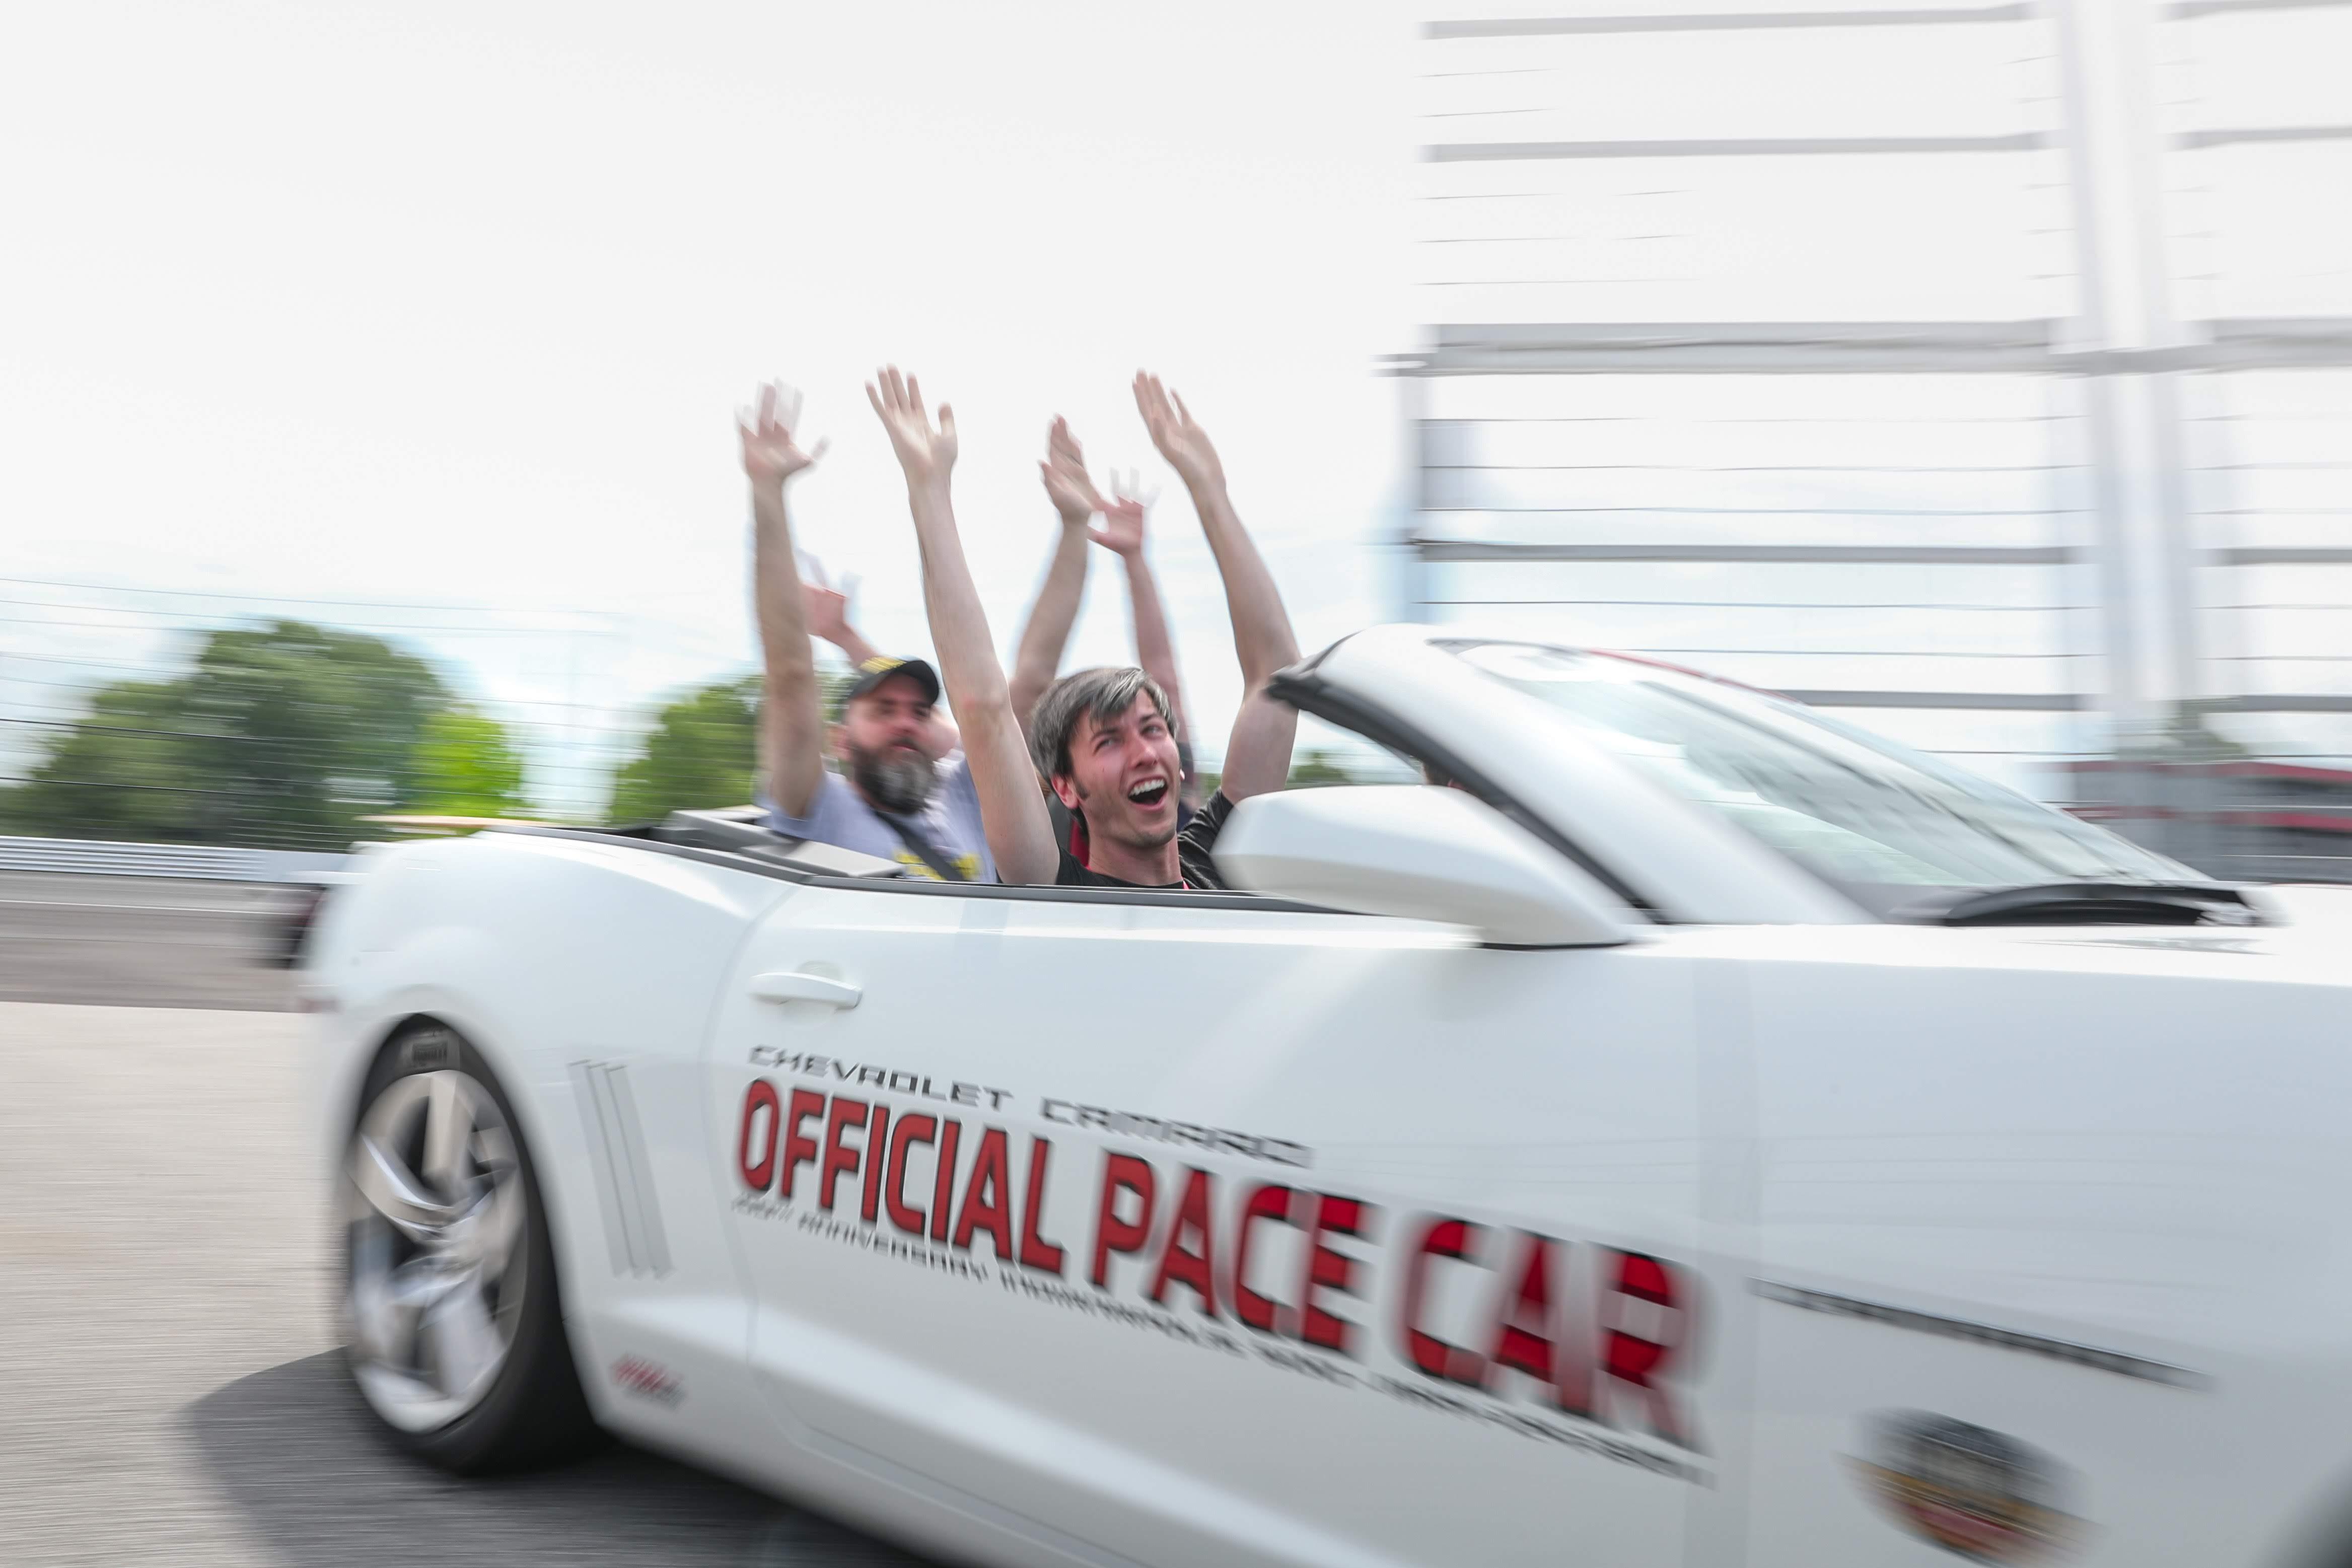 exclusive-pace-car-rides